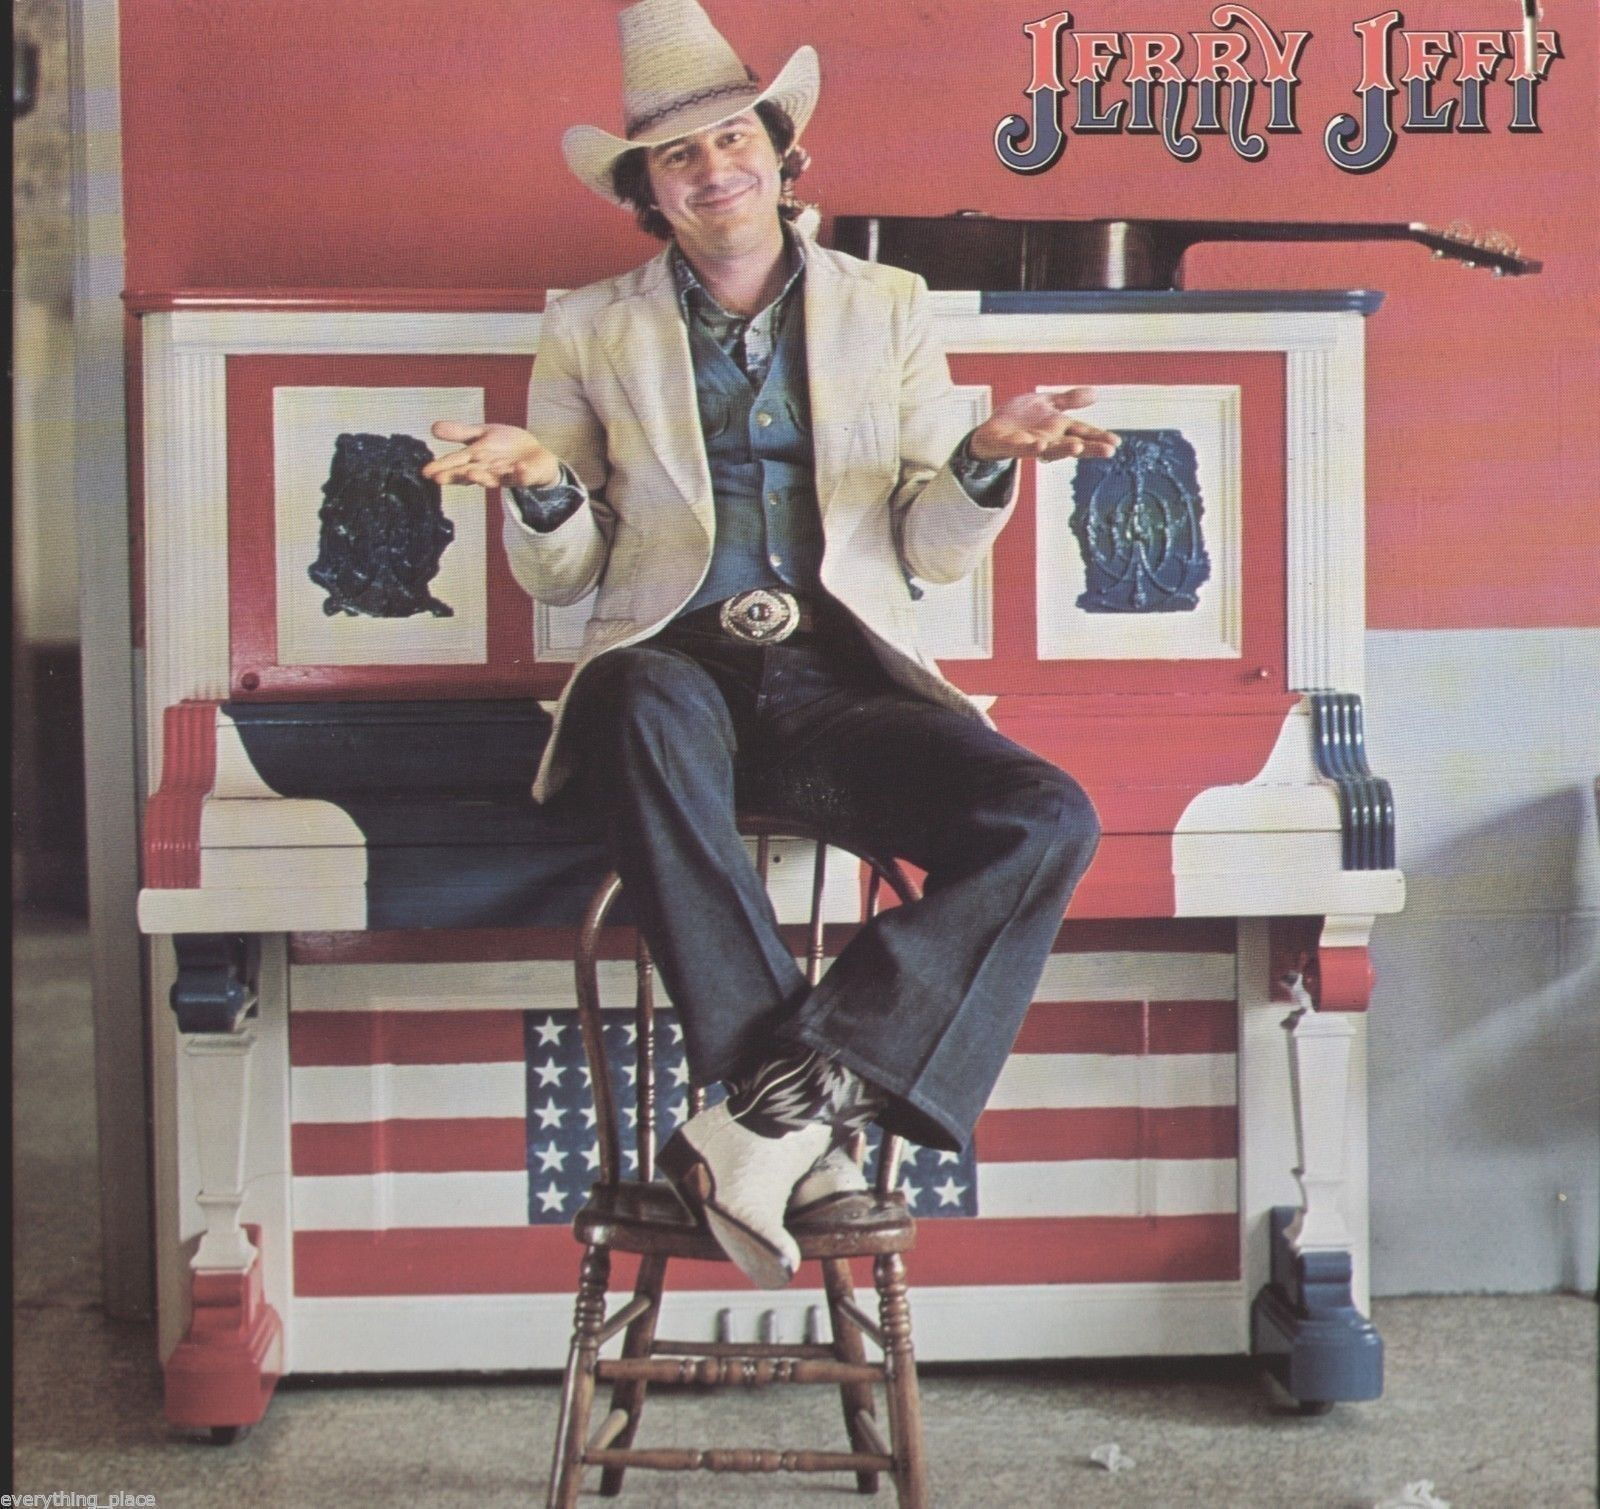 Jerry Jeff Walker Jerry Jeff Vinyl Lp Record Album Vintage Vinyl Records Jerry Jeff Walker Vinyl Record Album